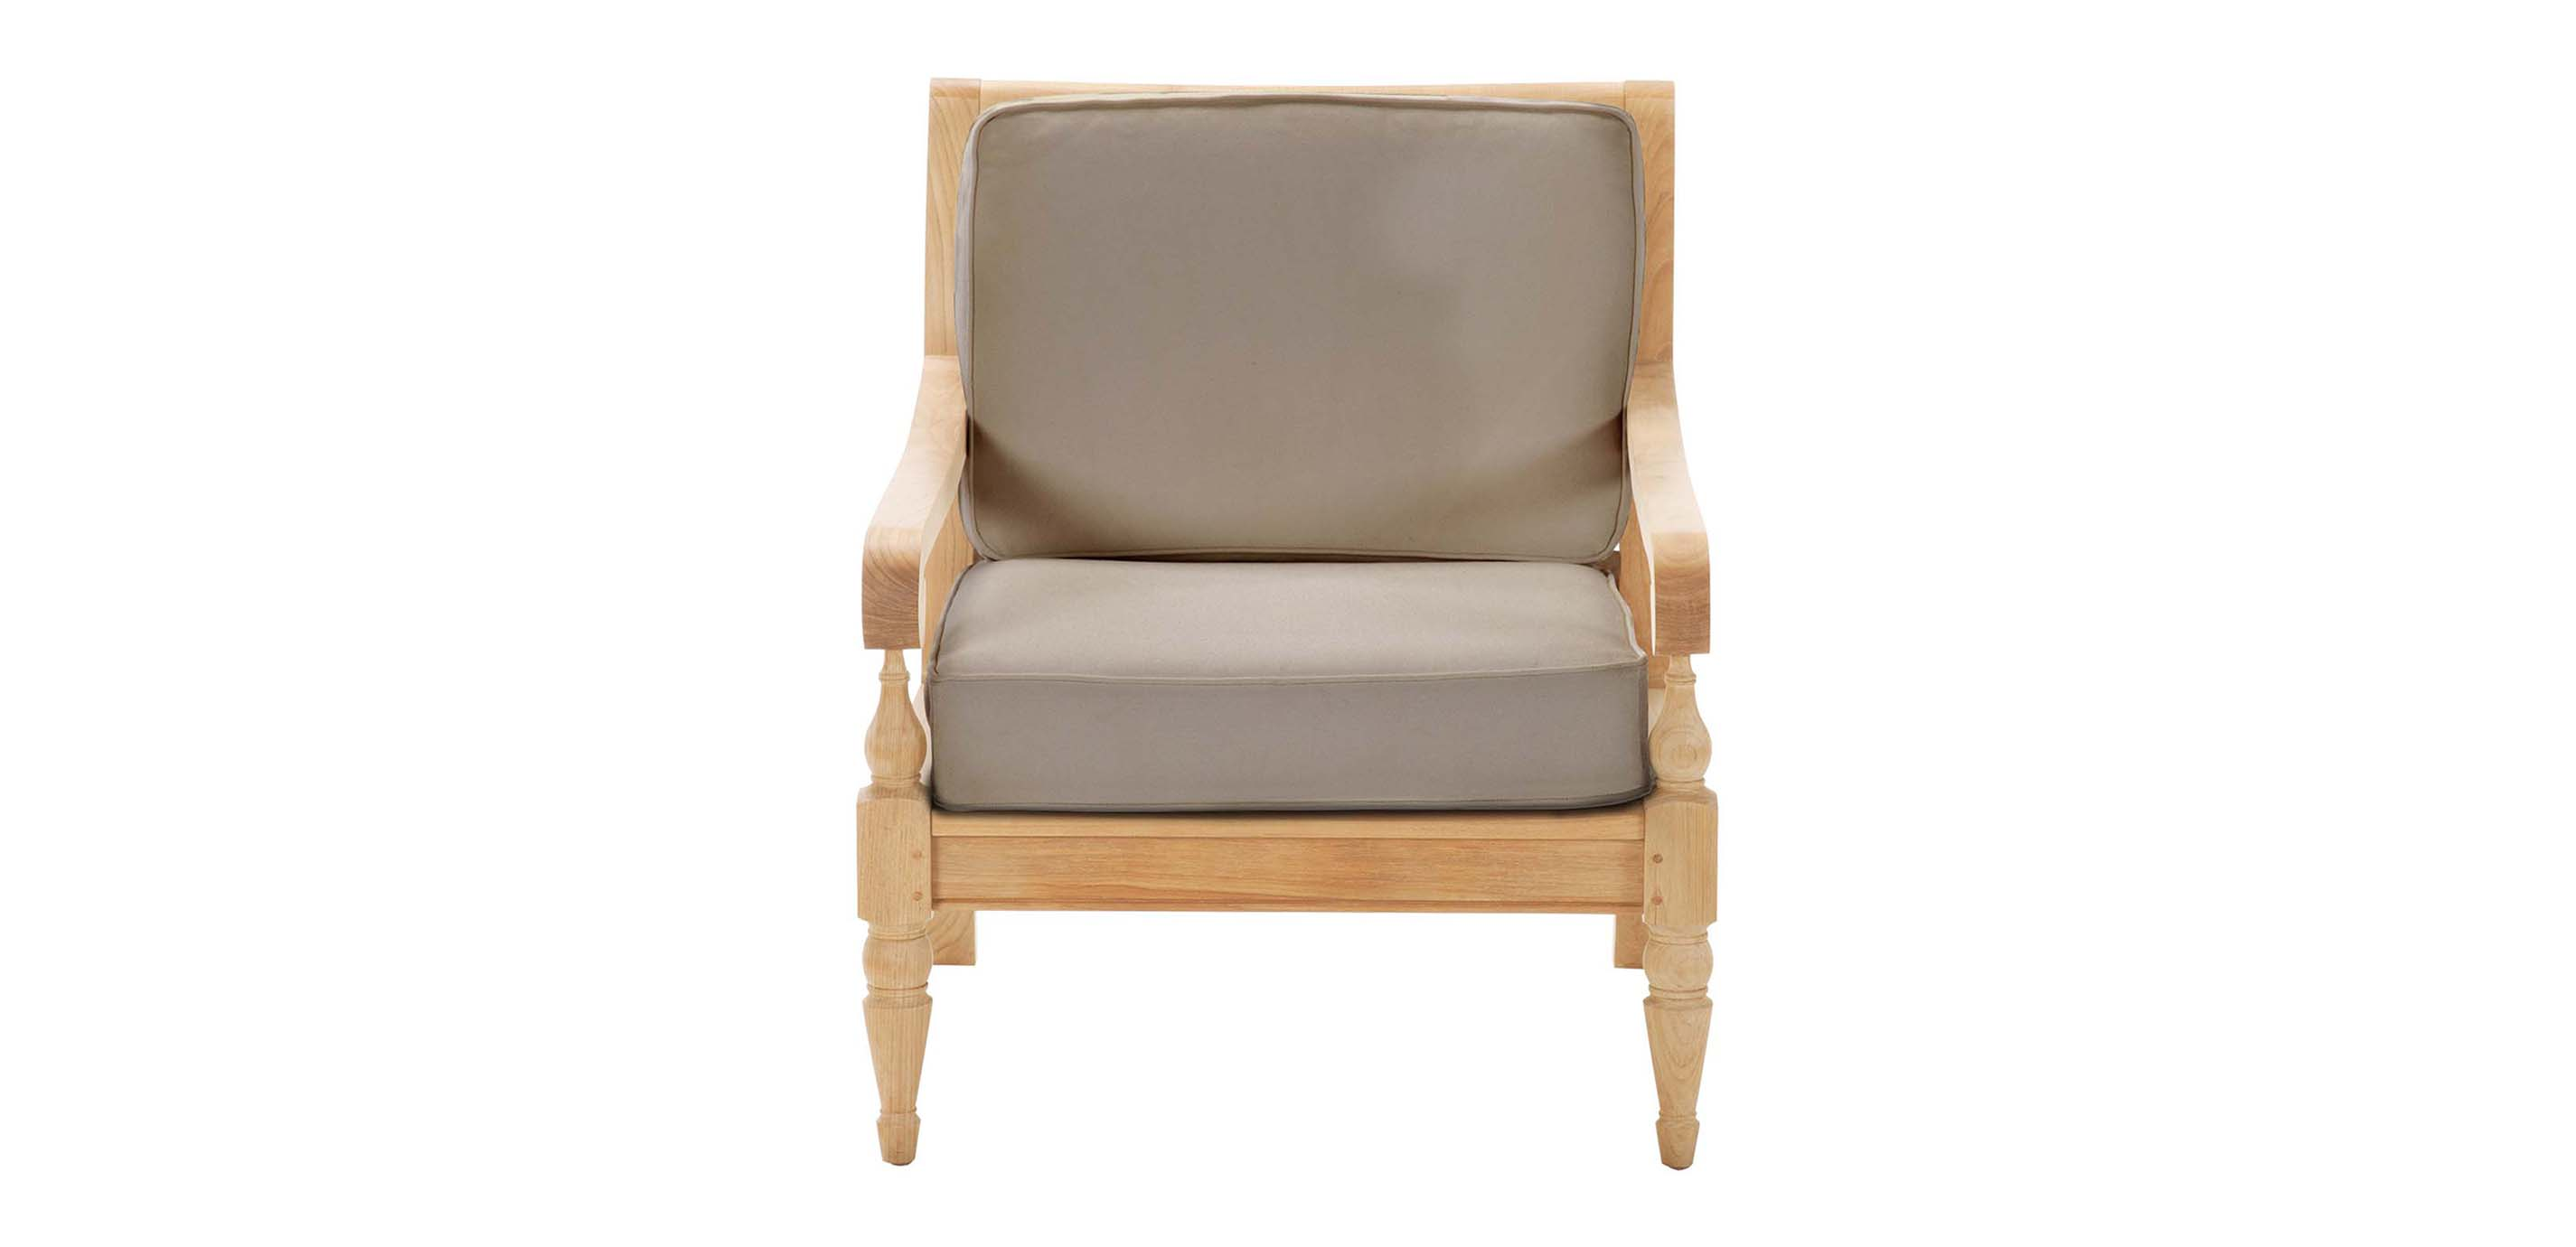 Millbrook Lounge Chair Millbrook Collection Ethan Allen